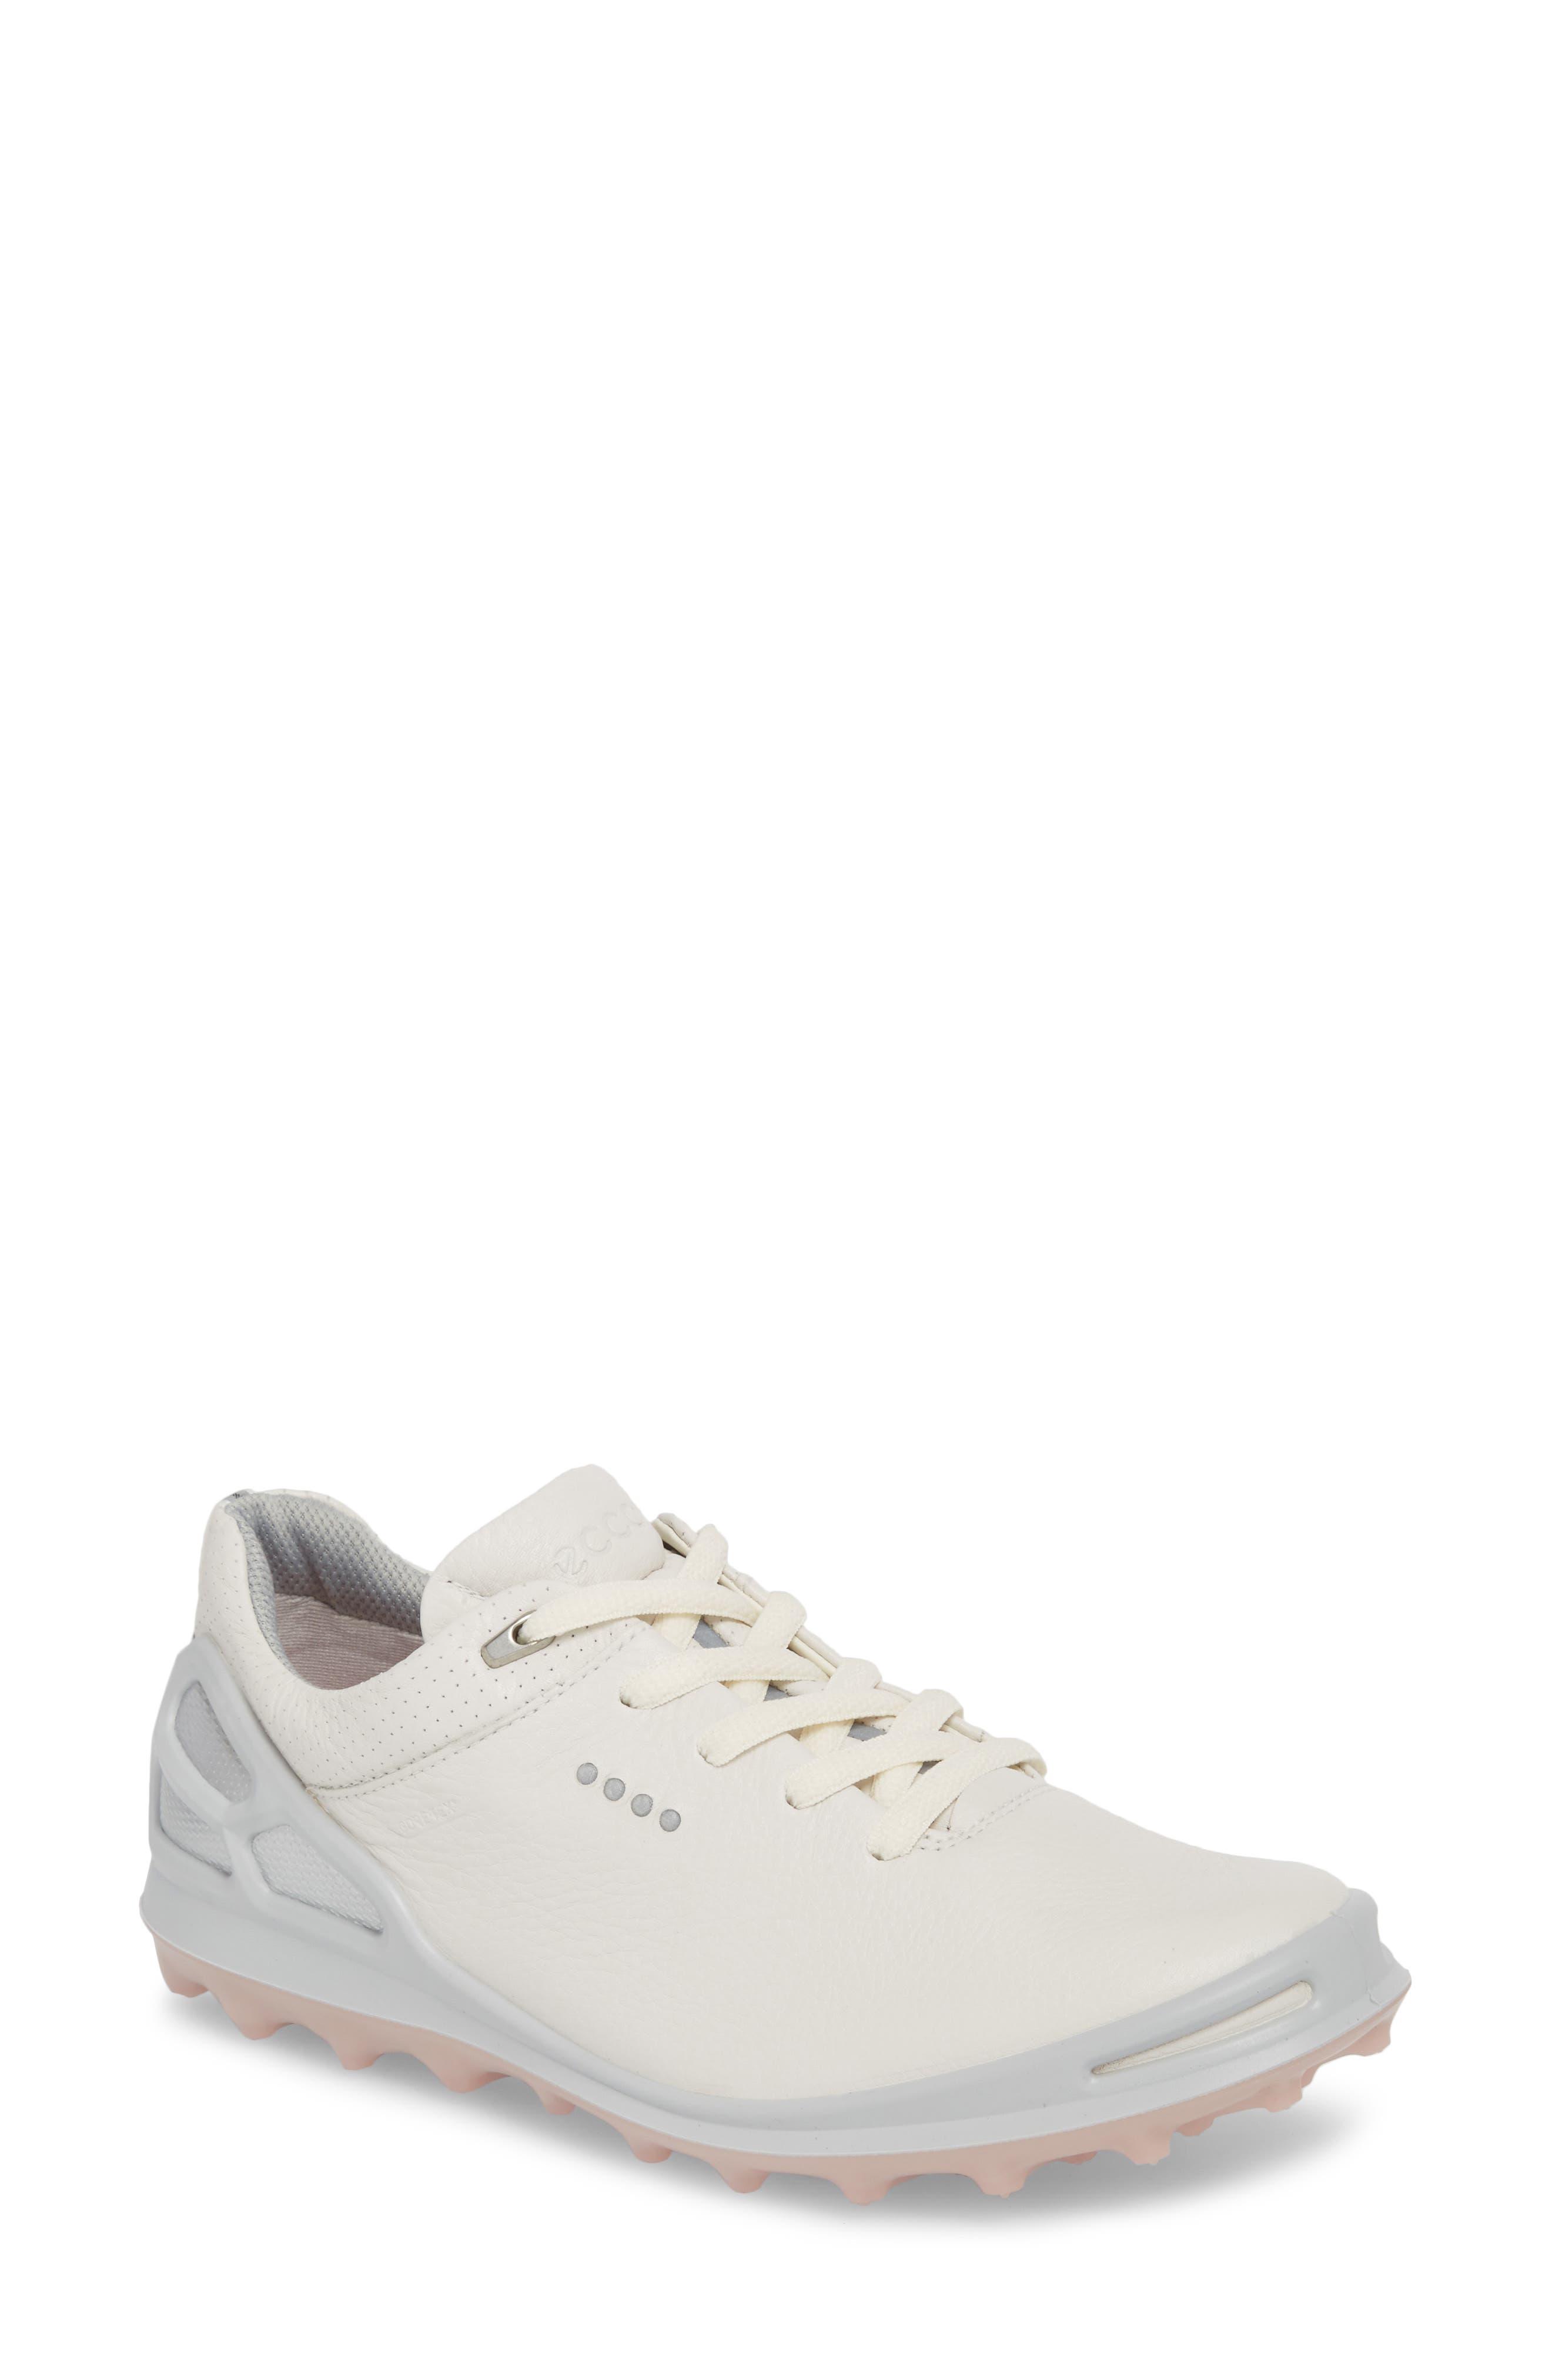 Ecco Golf Cage Pro Gore-Tex Waterproof Shoe, White